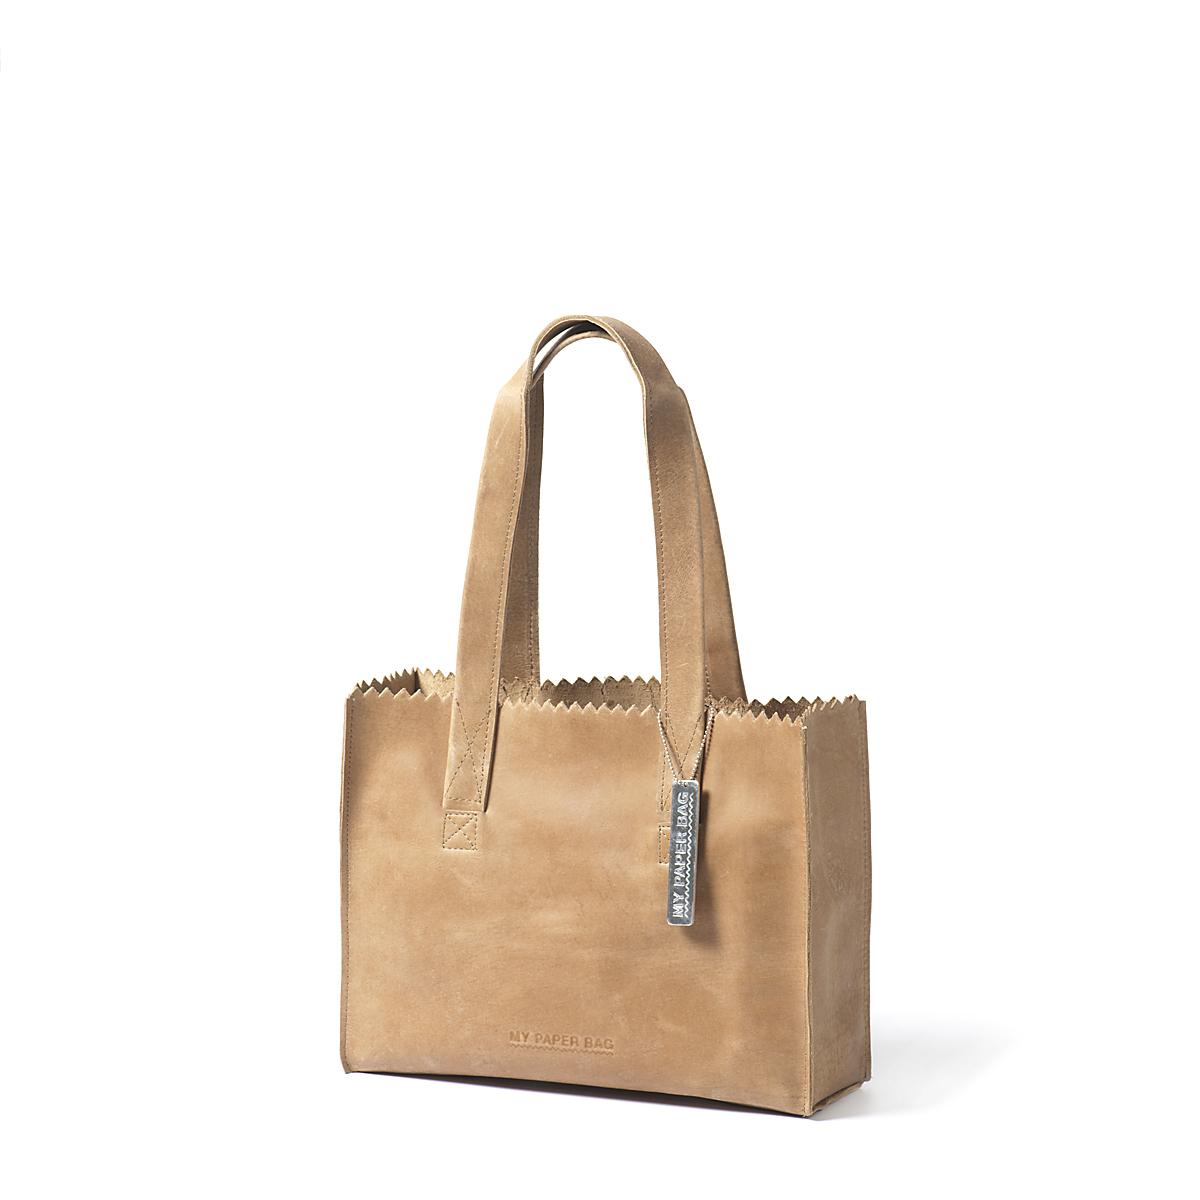 blond My paper bag handbag good for all